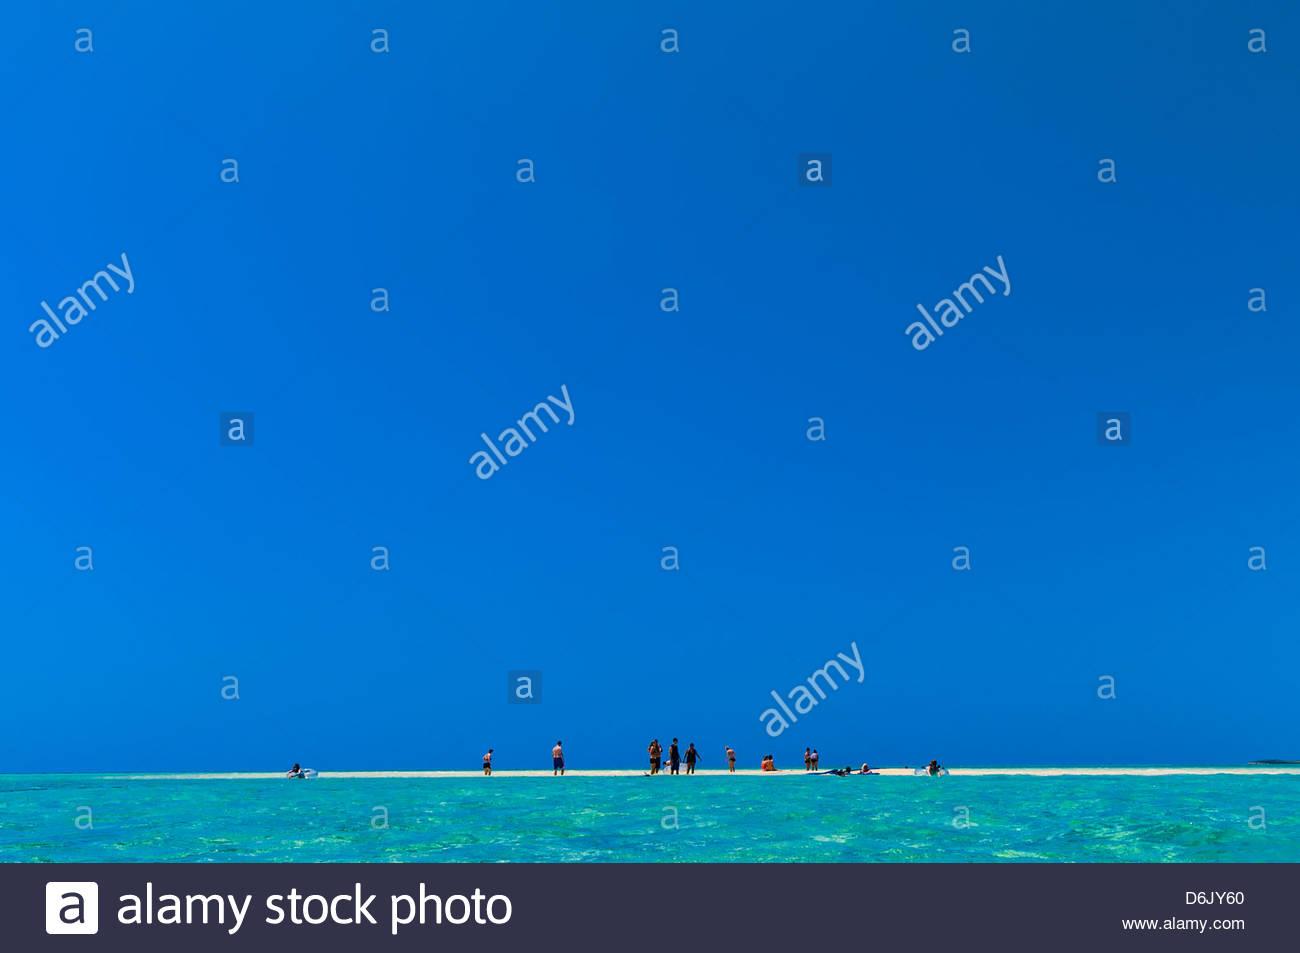 A sandbar in the ocean off Serenity Bay, Castaway Cay (Disney's private island), The Bahamas - Stock Image